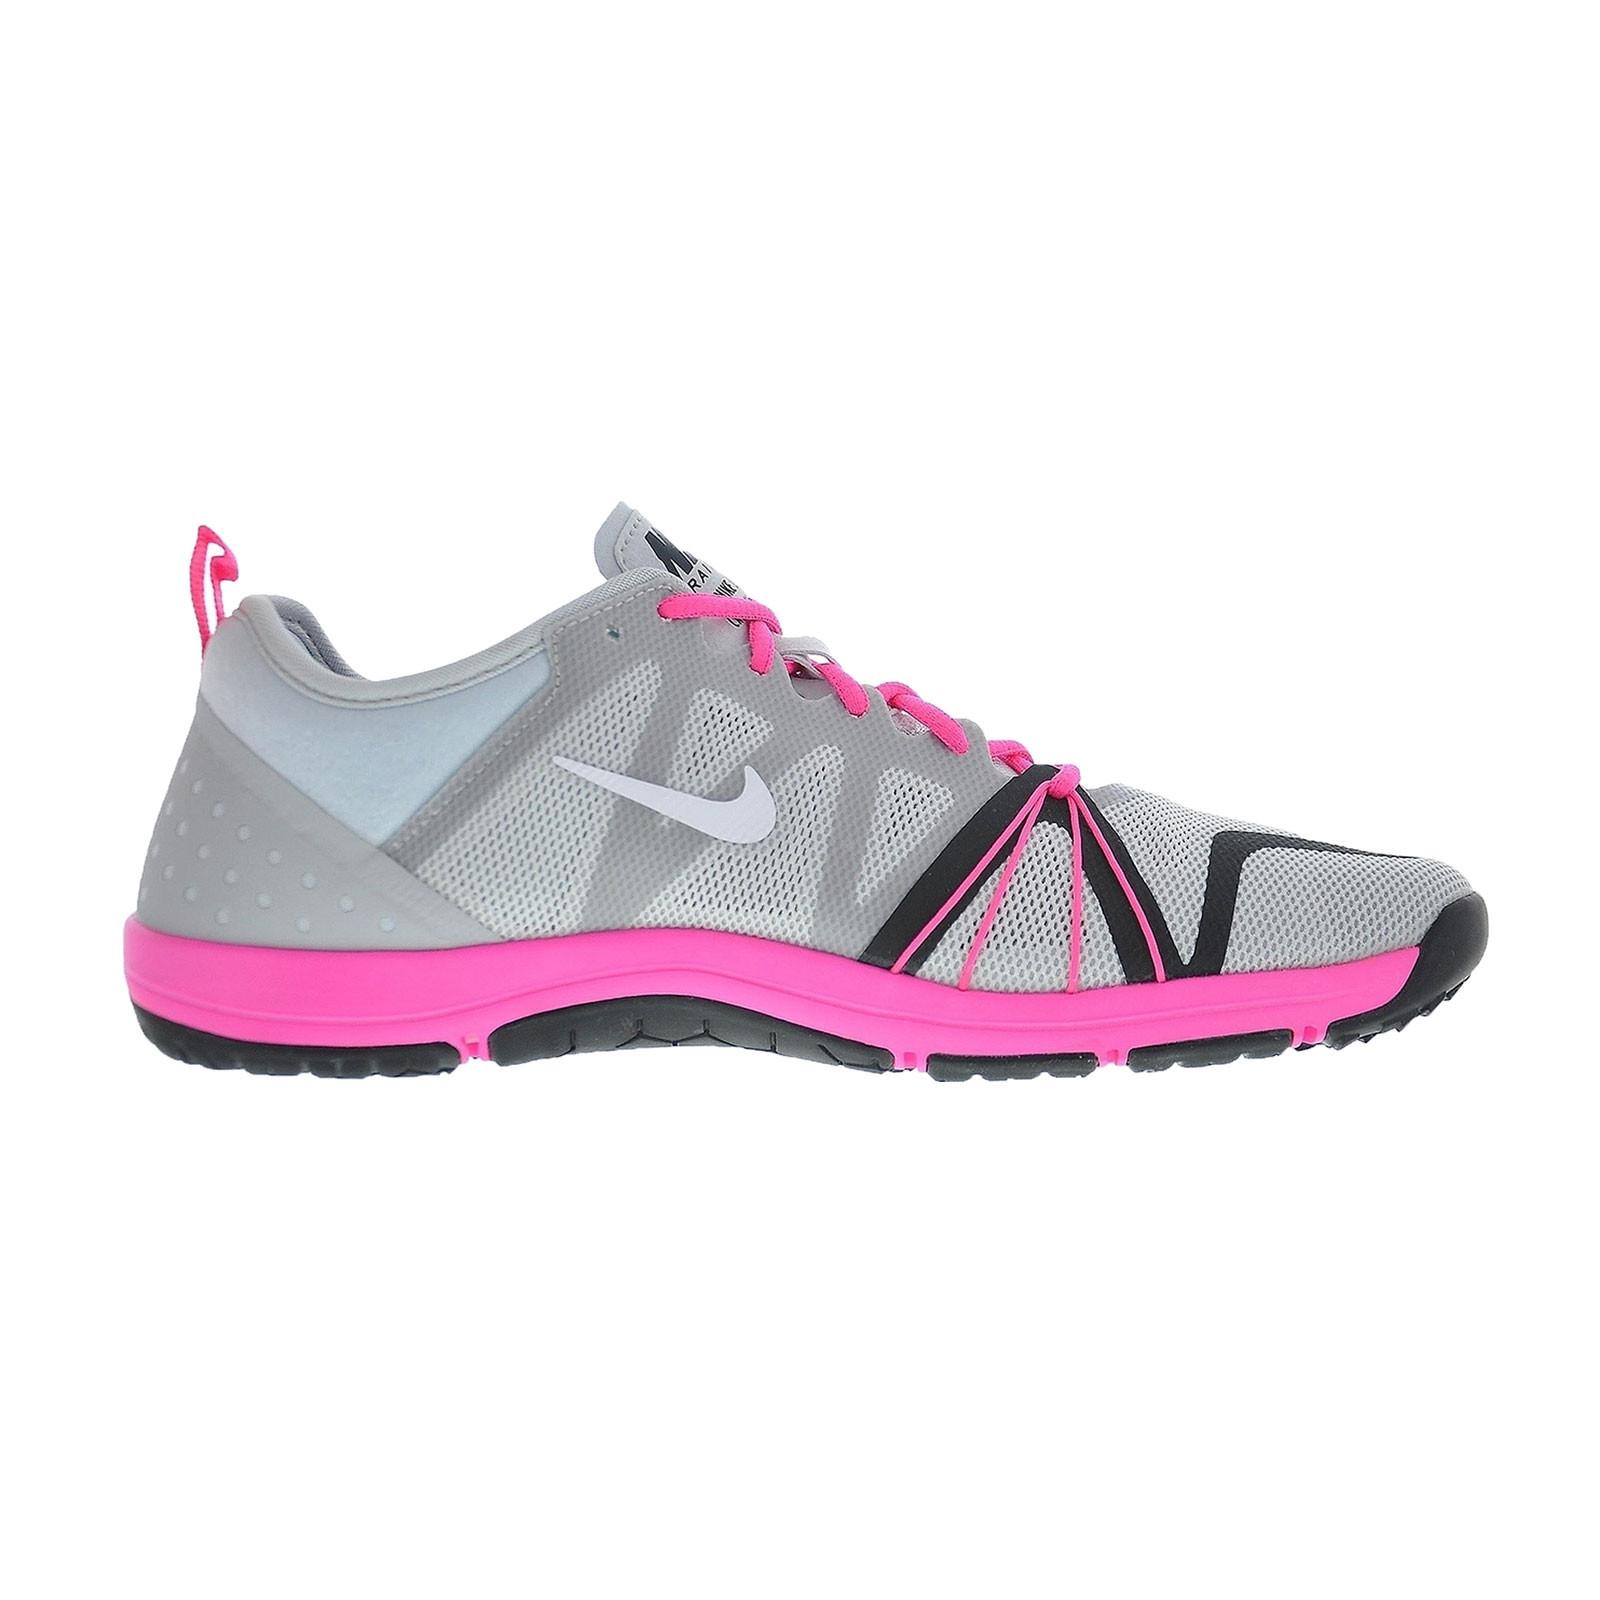 global Decepcionado Madison  Zapatillas Nike Wmns Nike Free Cross Compete Training para Mujer | Runa  Store